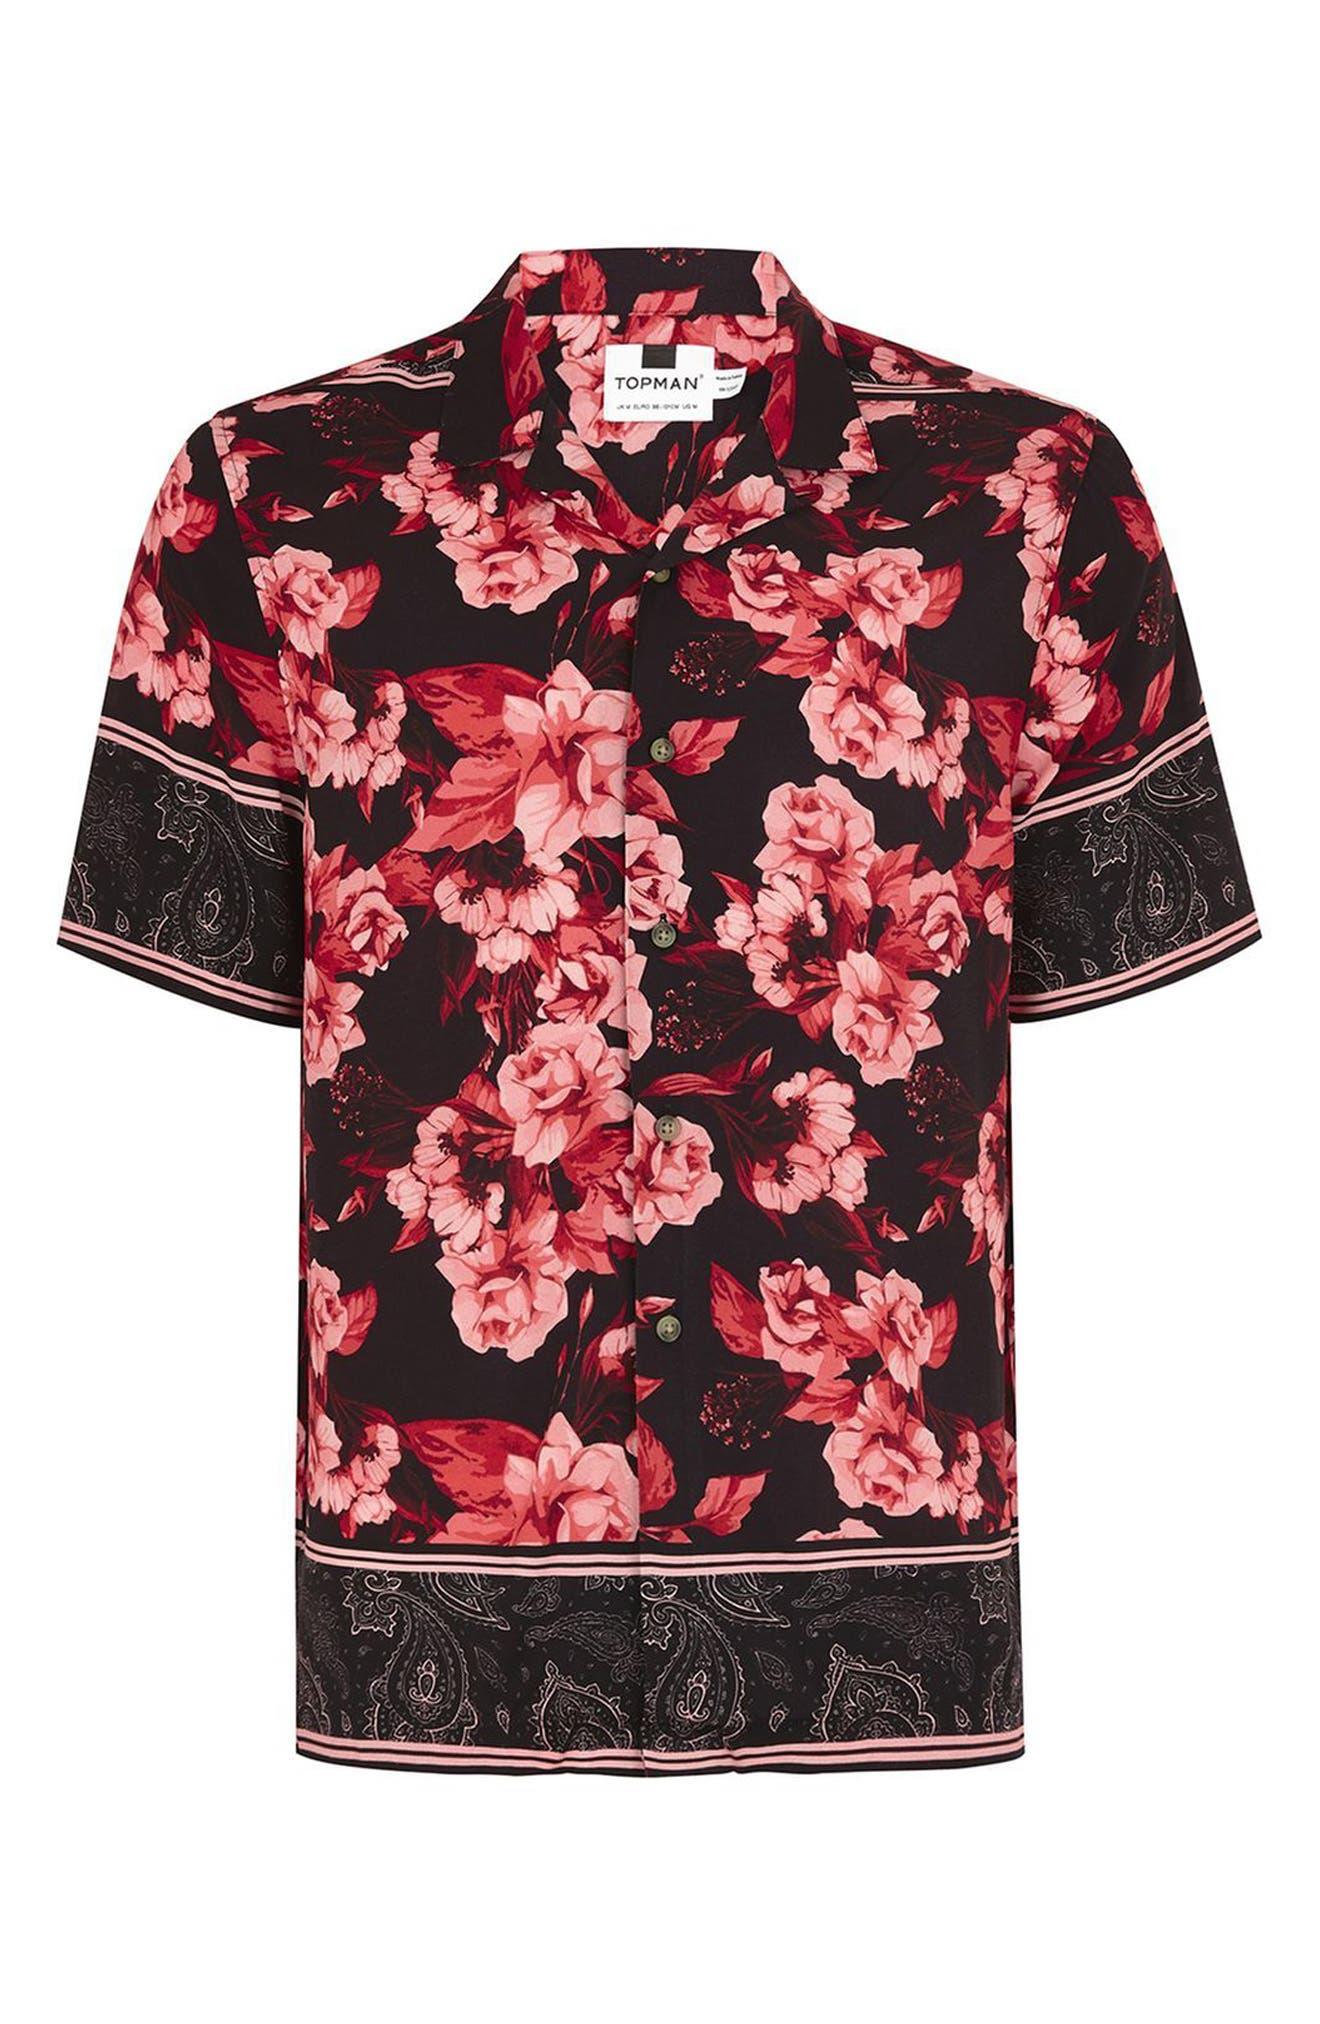 TOPMAN,                             Floral Print Shirt,                             Alternate thumbnail 4, color,                             640